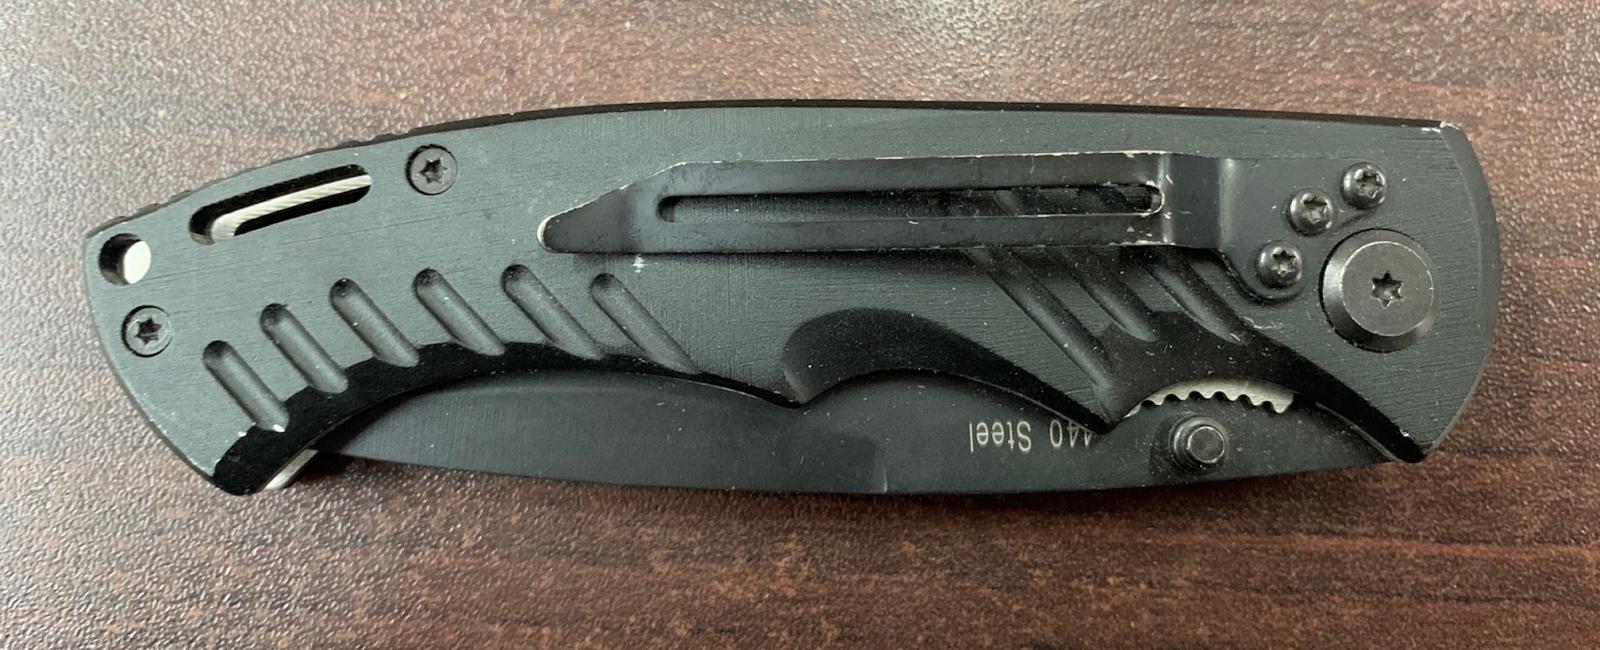 Складной нож Viking Nordway с темной рукоятью